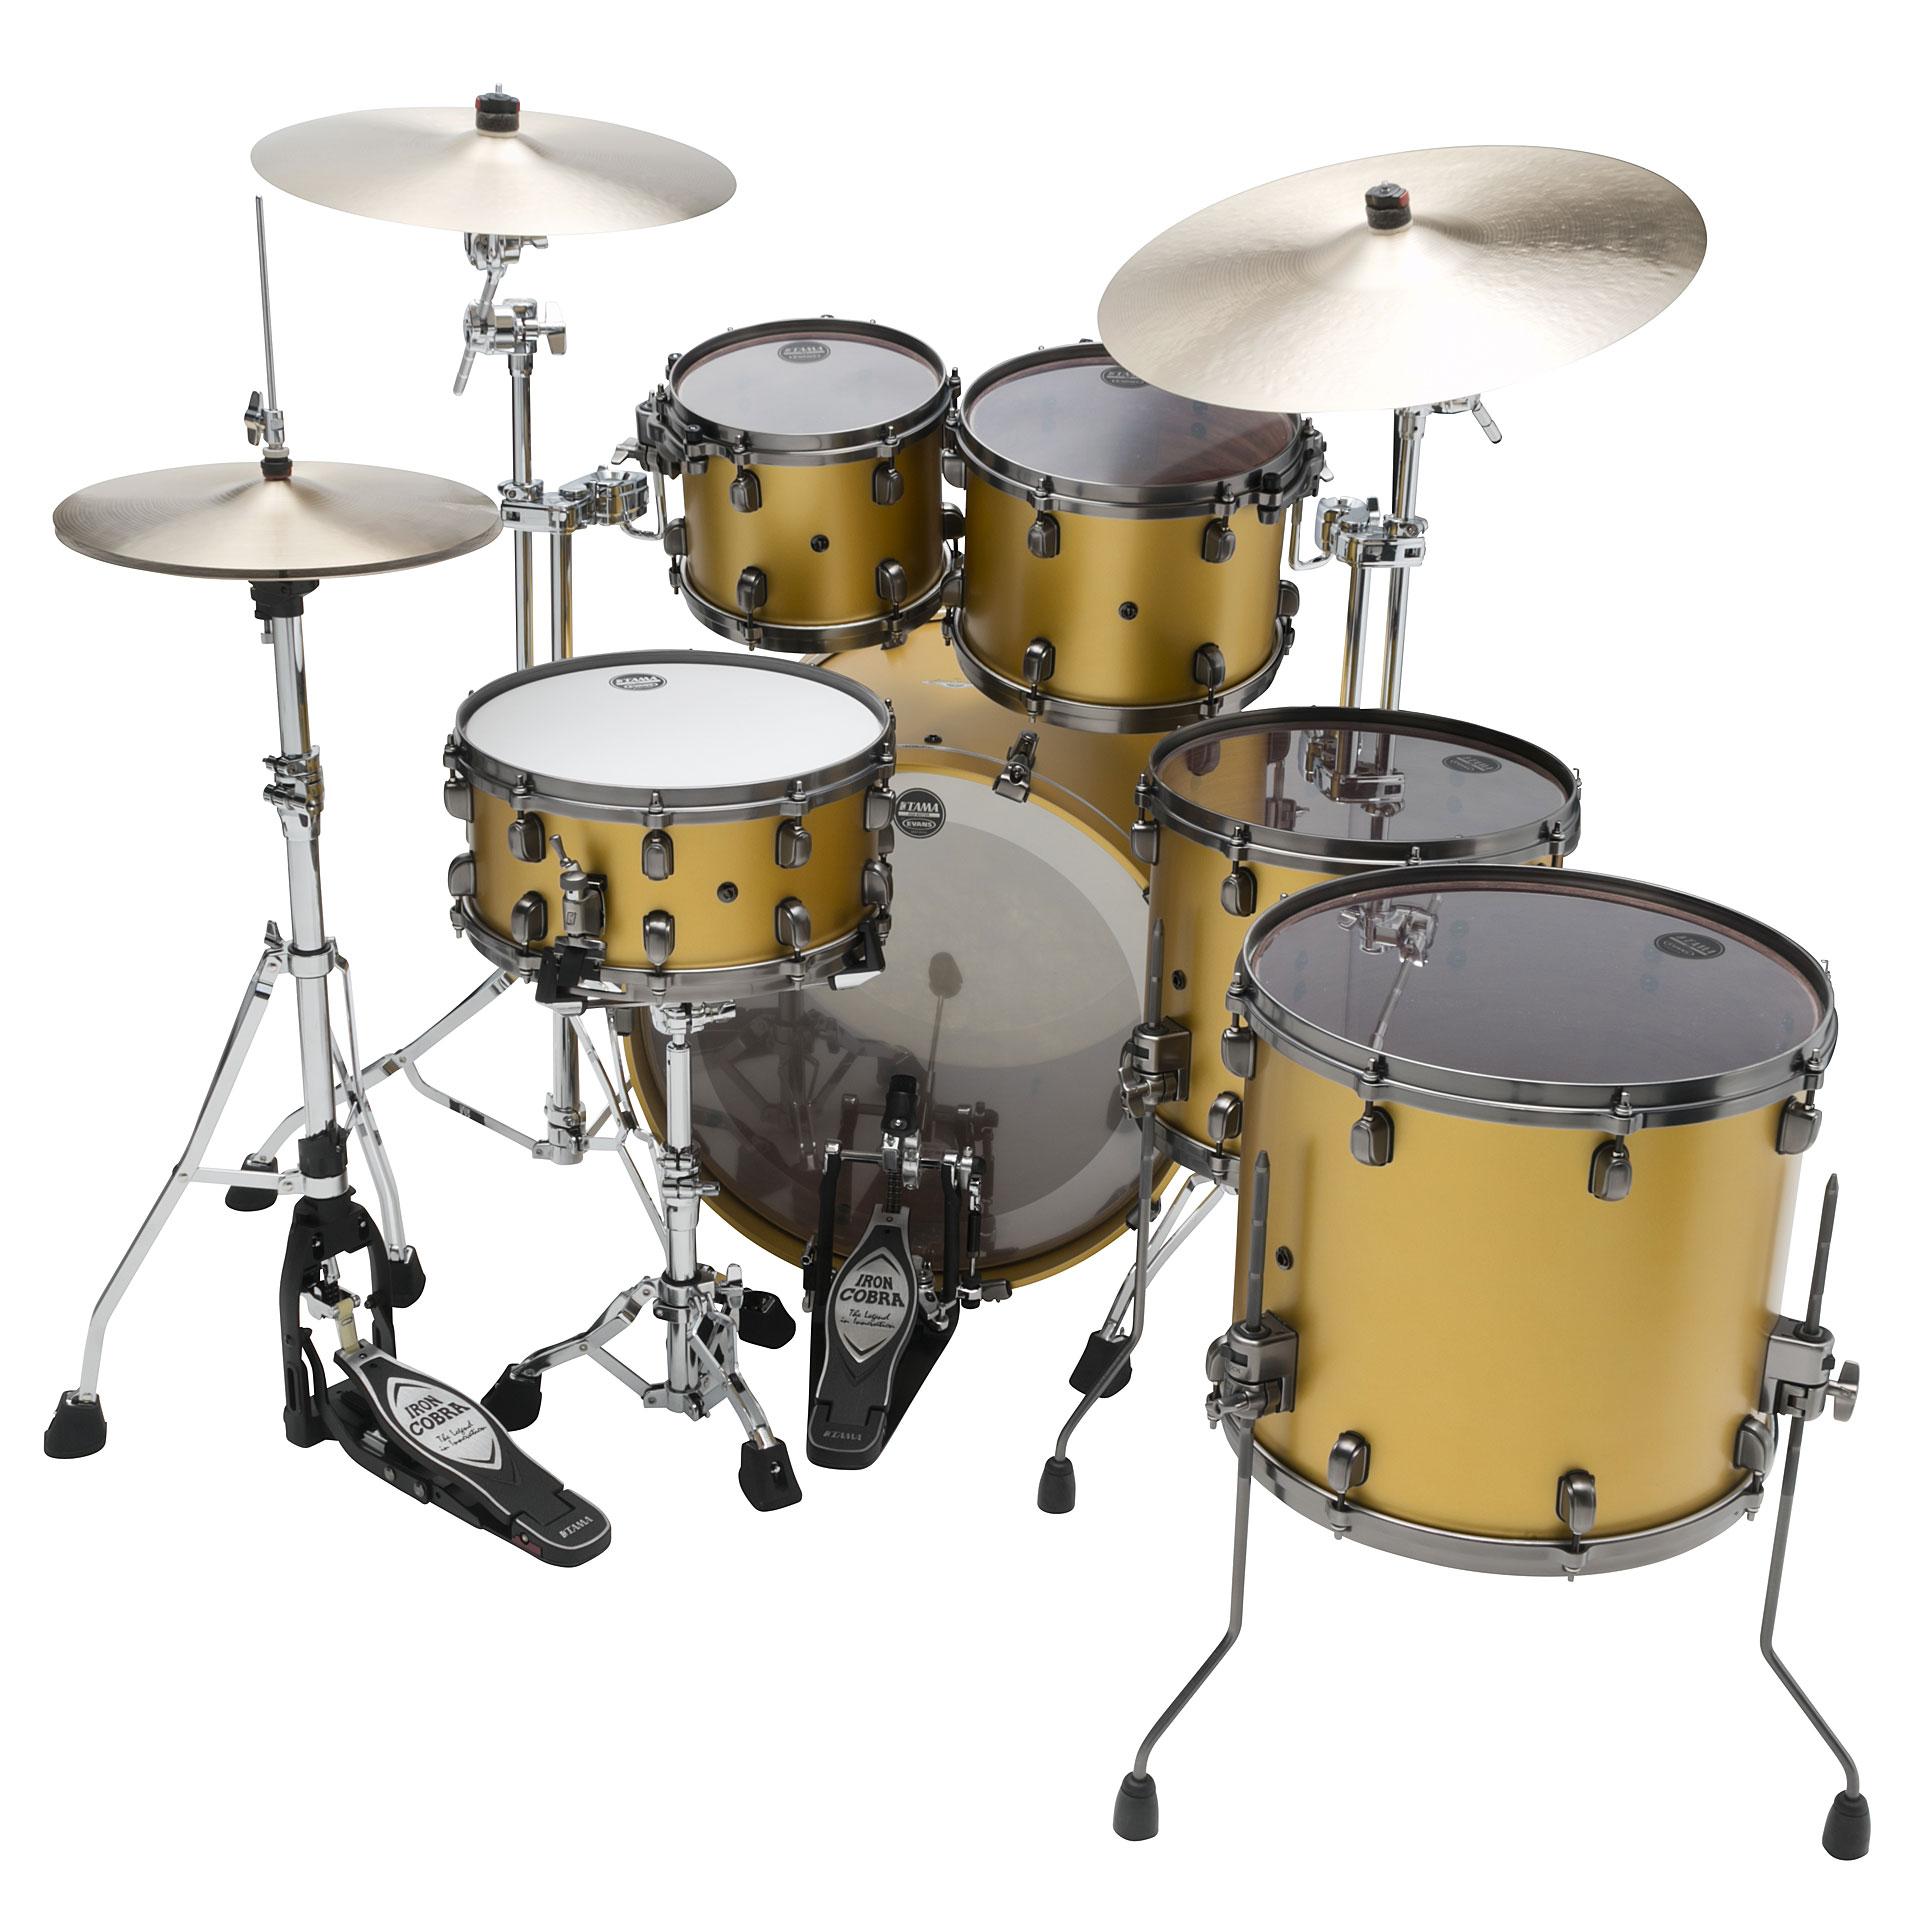 tama starclassic bubinga 22 satin aztec gold metallic drum kit. Black Bedroom Furniture Sets. Home Design Ideas